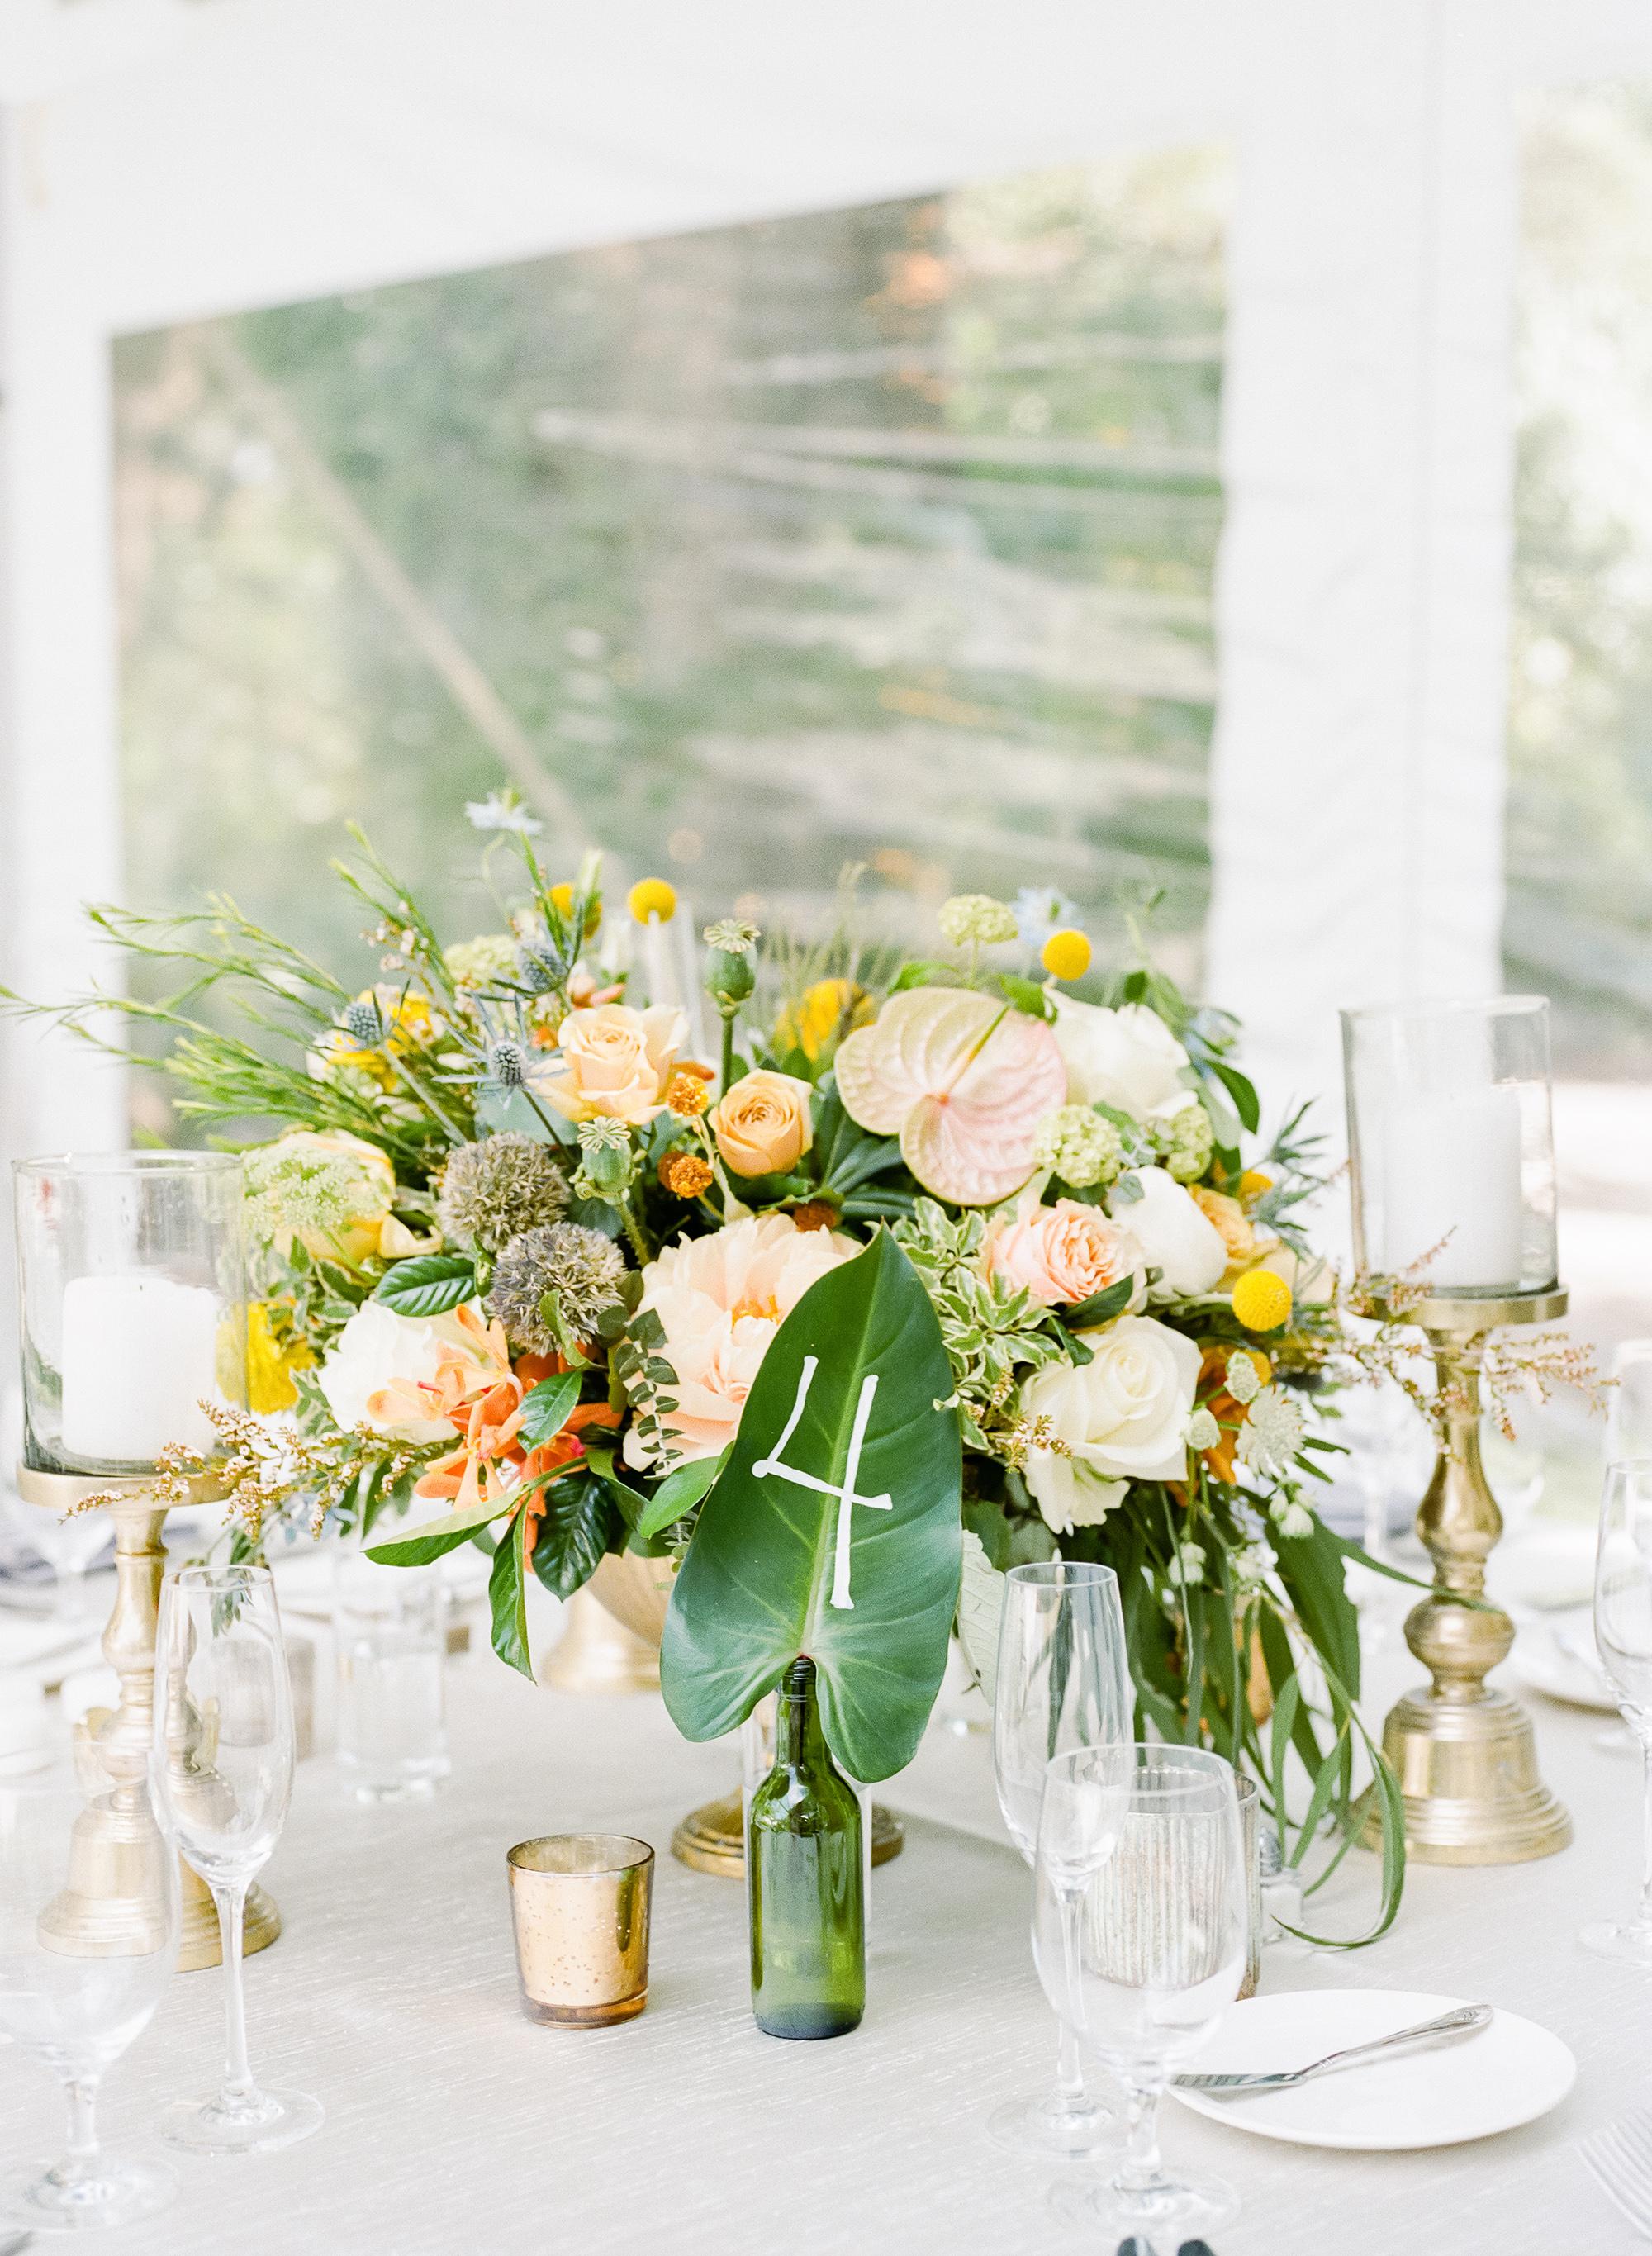 anuja nikhil wedding colorful centerpiece